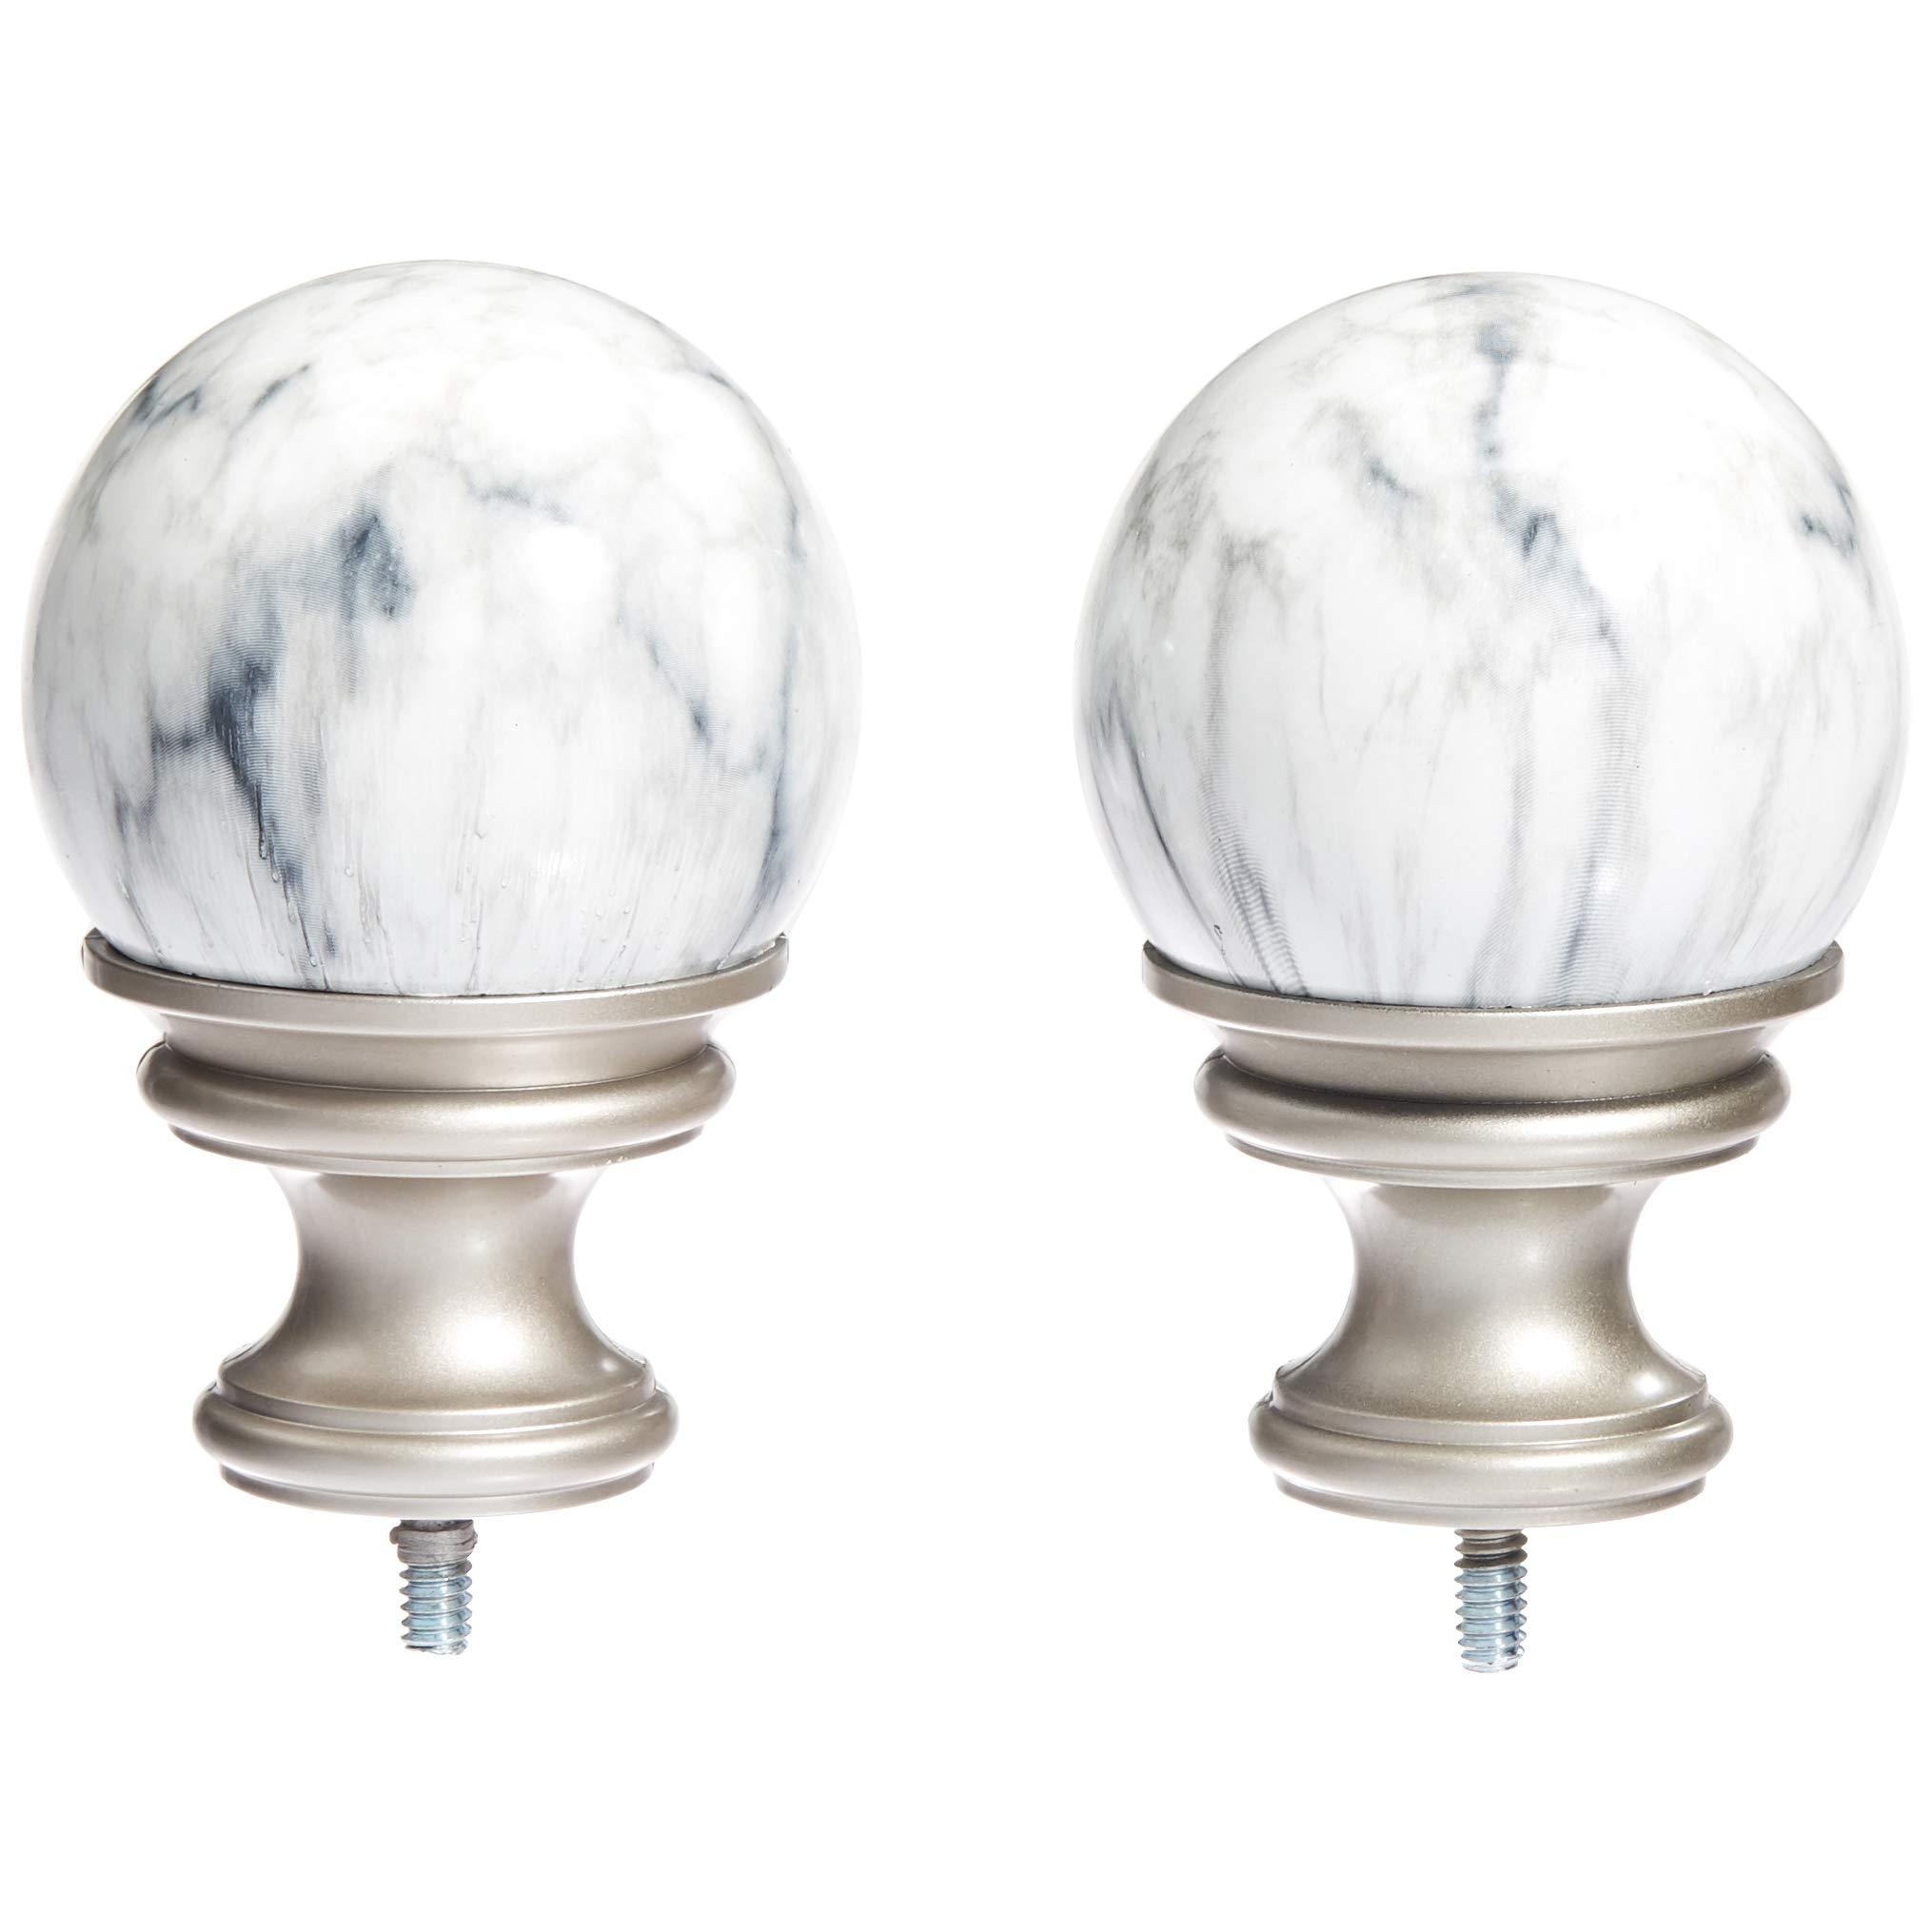 AmazonBasics White Marble Ball Curtain Rod Finials, Set of Two, Nickel by AmazonBasics